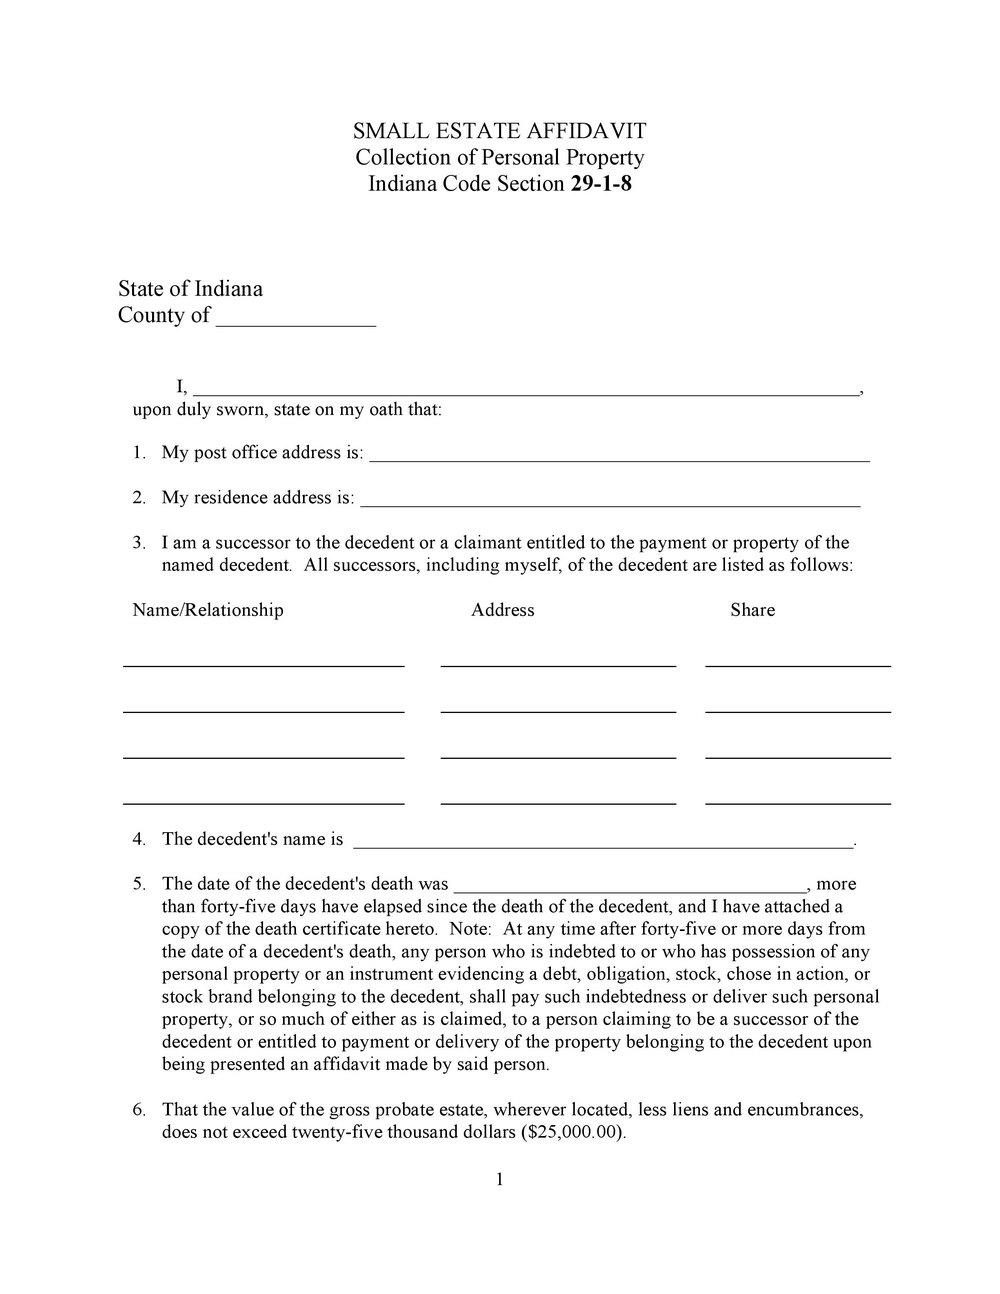 Small Estate Affidavit Form Texas